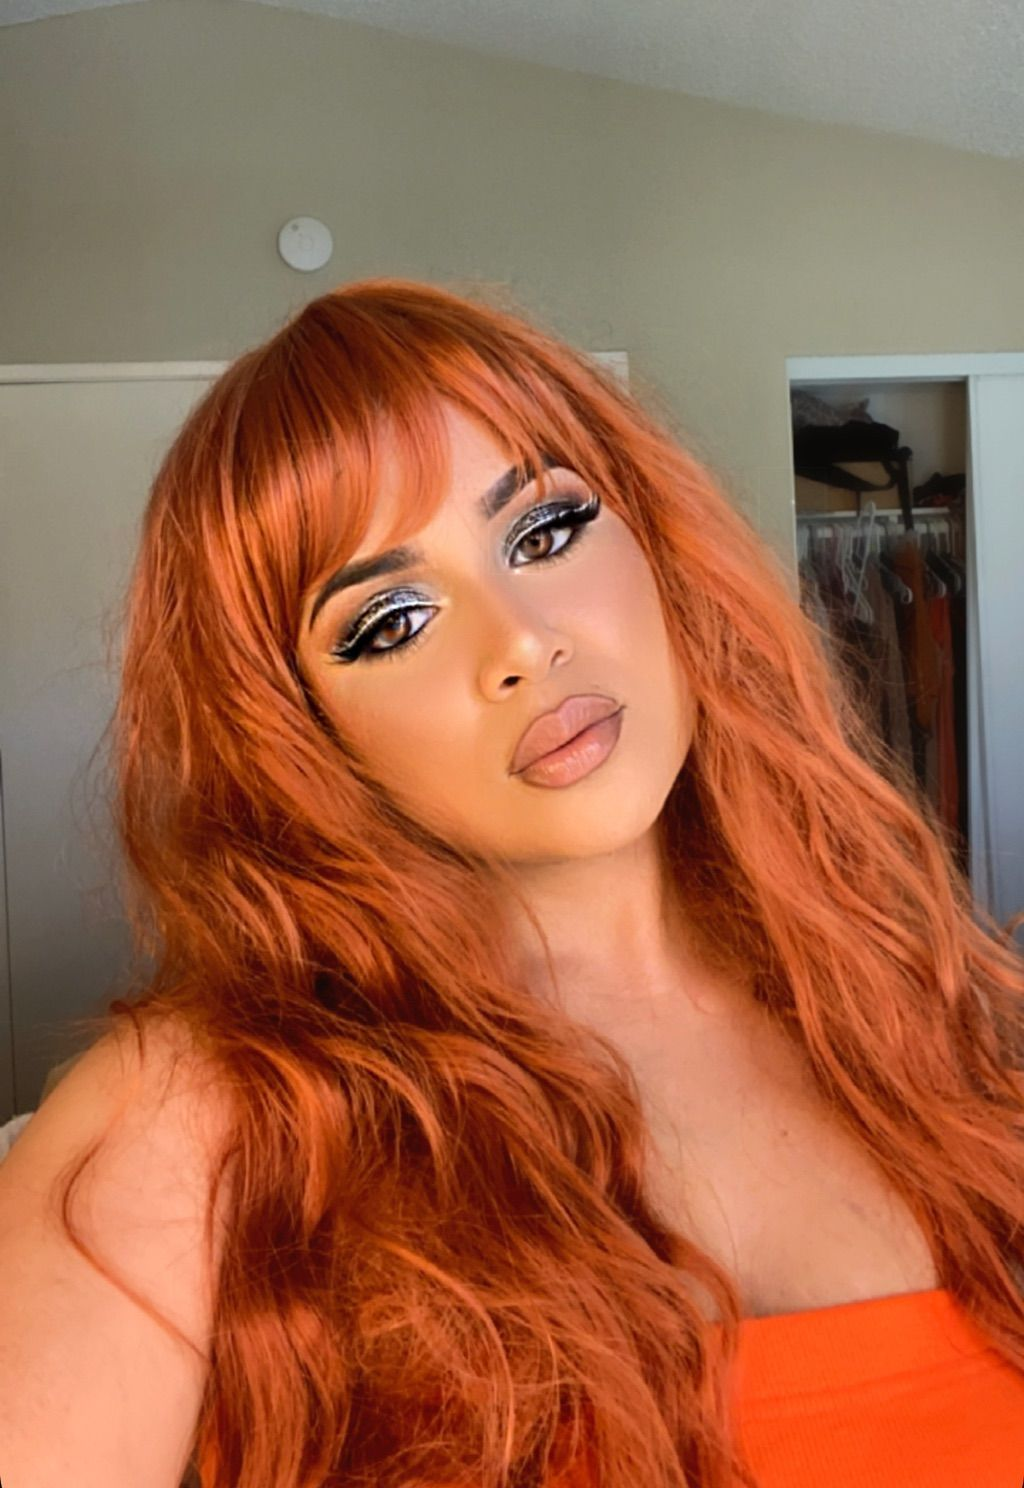 Makeupbynathaly